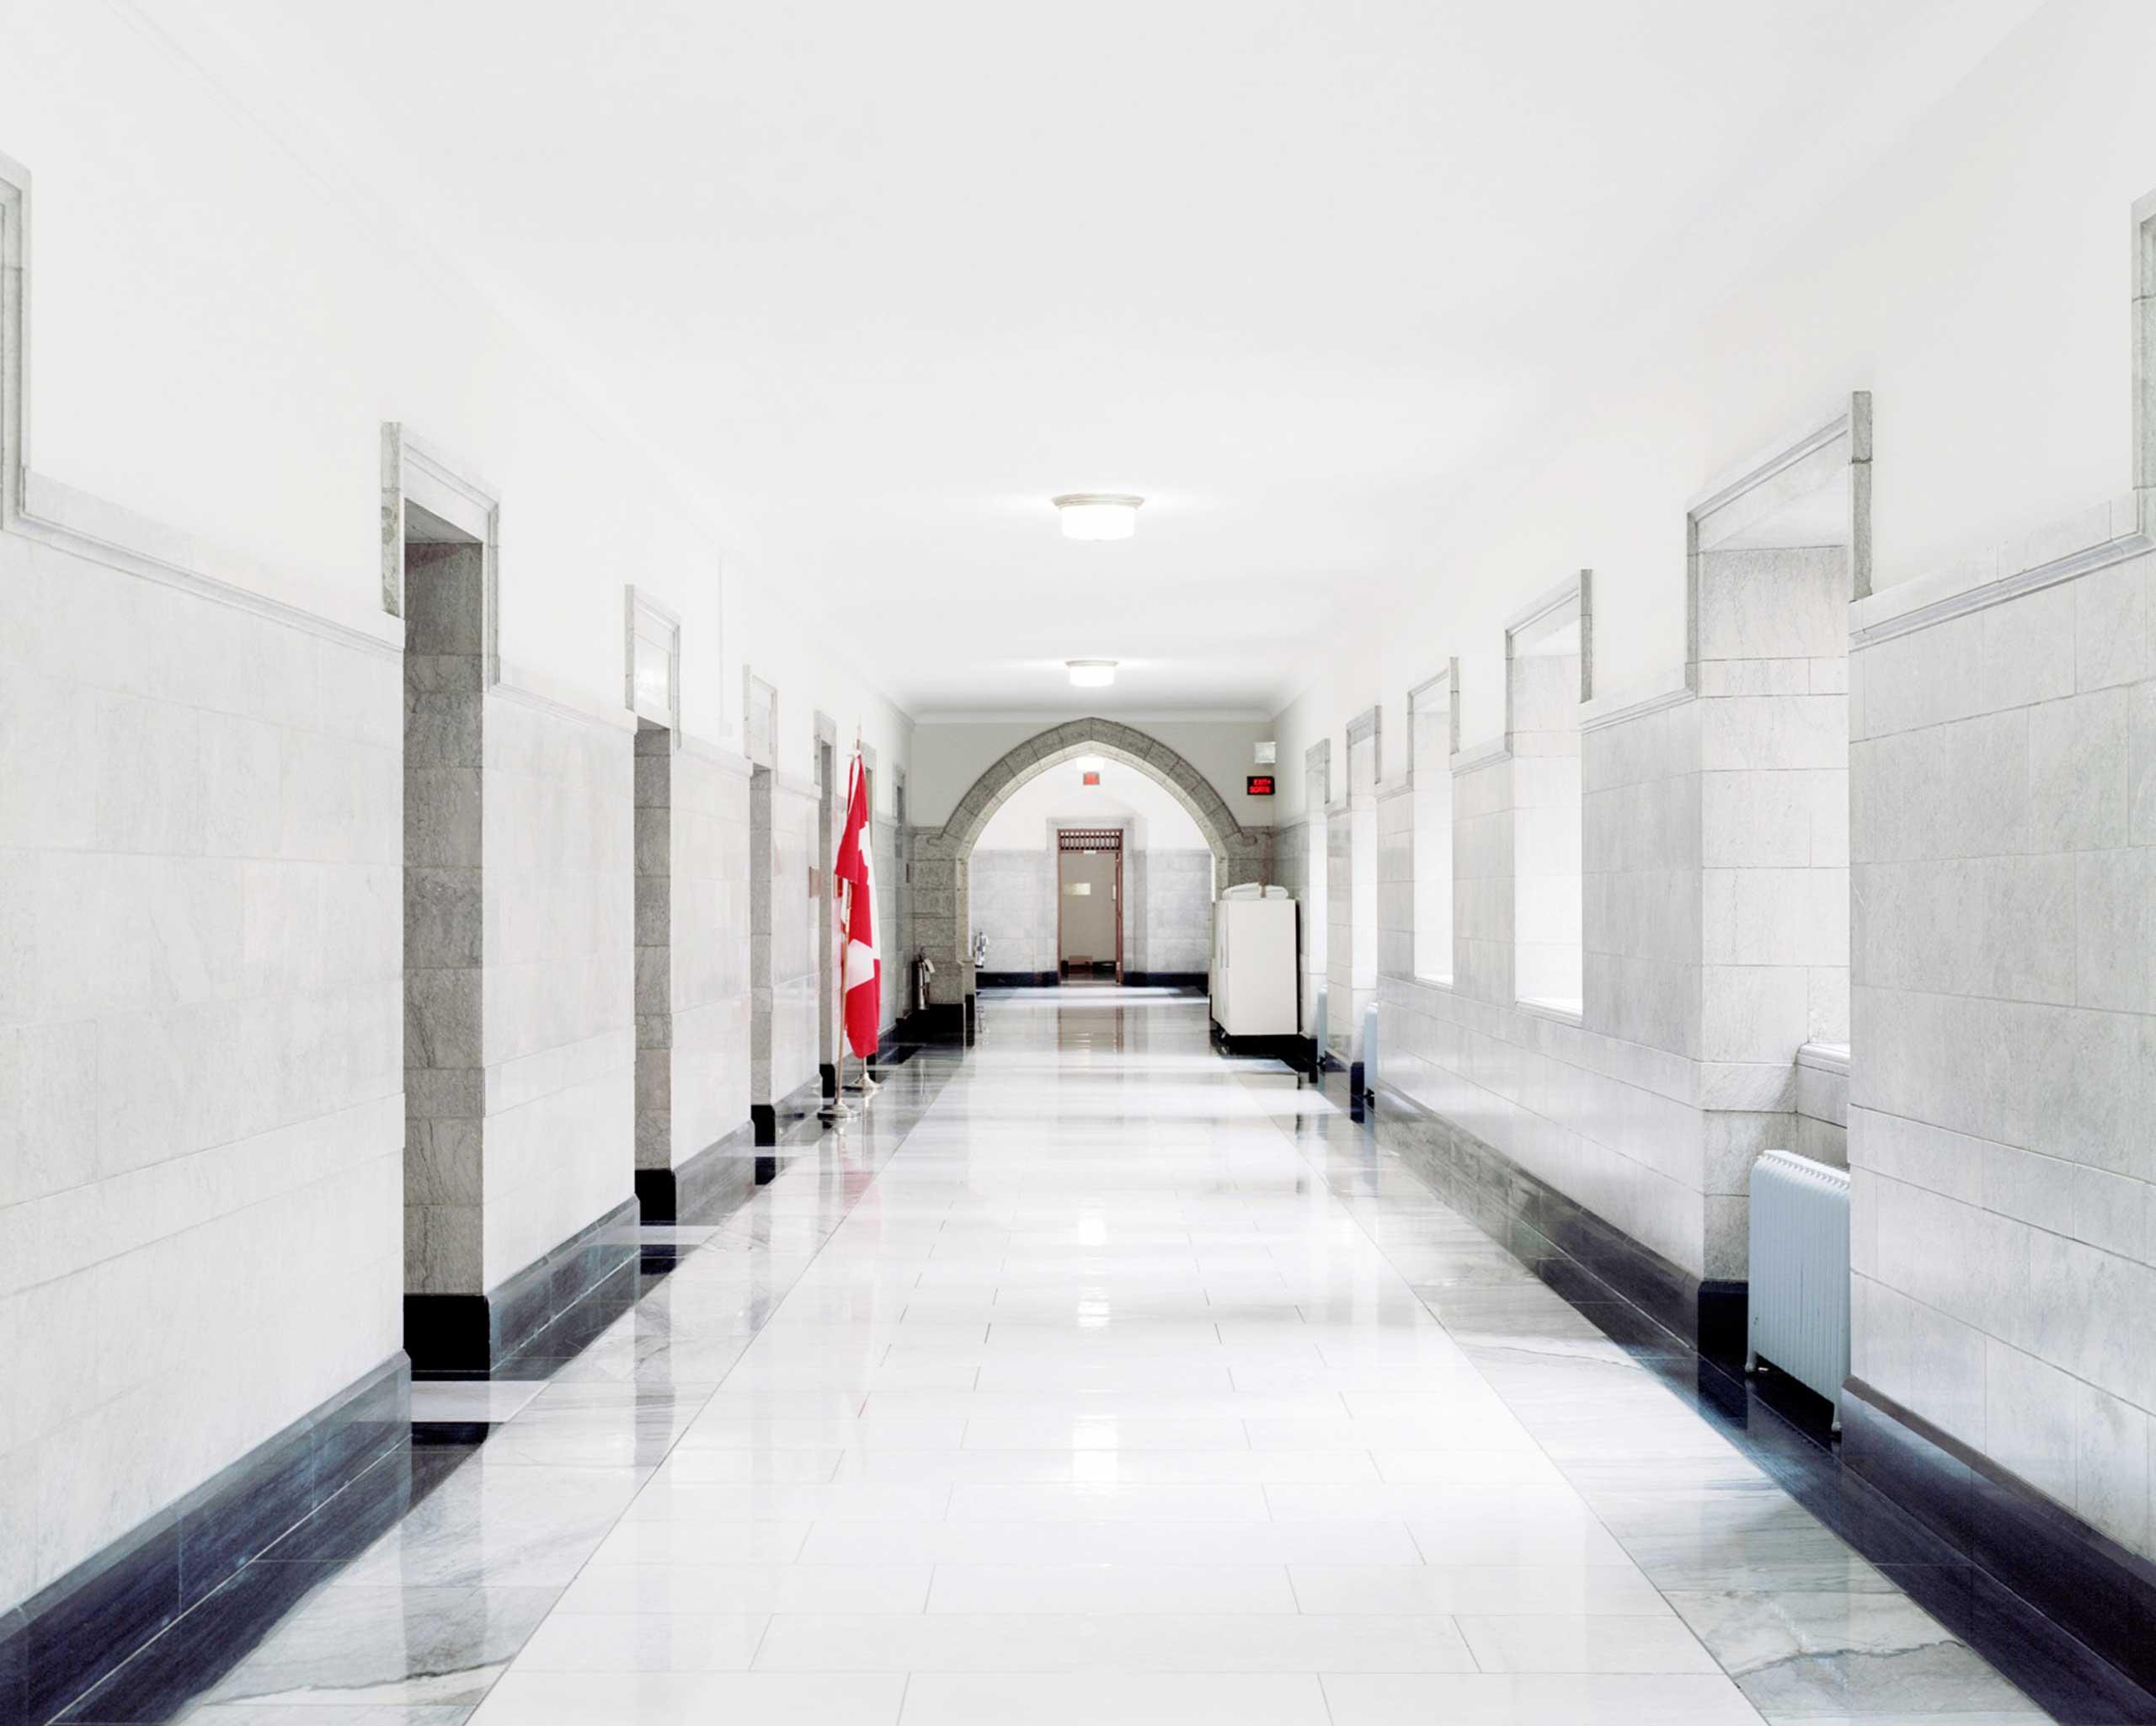 Corridor, 3rd floor, Center Block, Parliament Hill